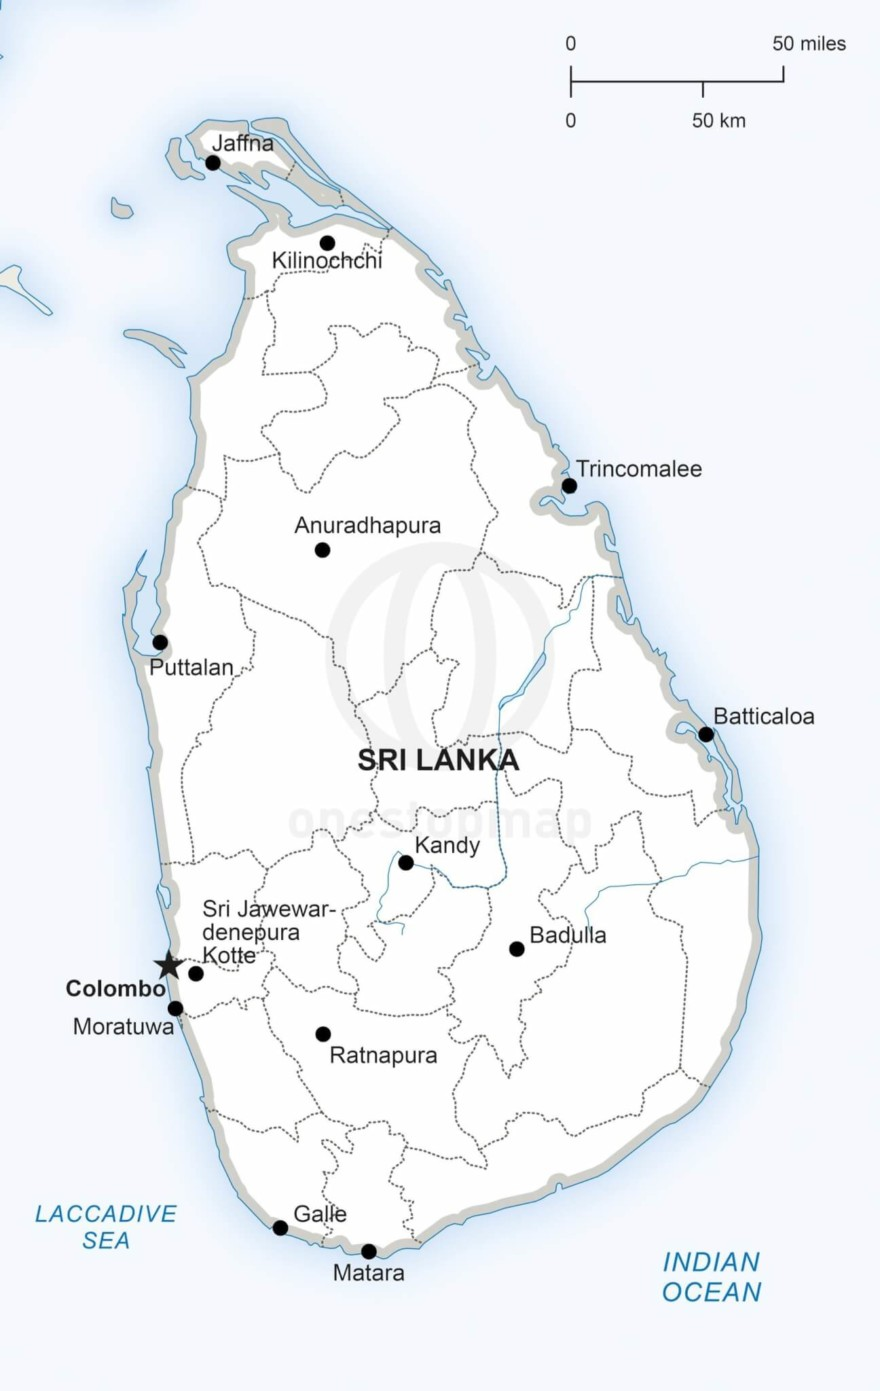 Map of Sri Lanka political